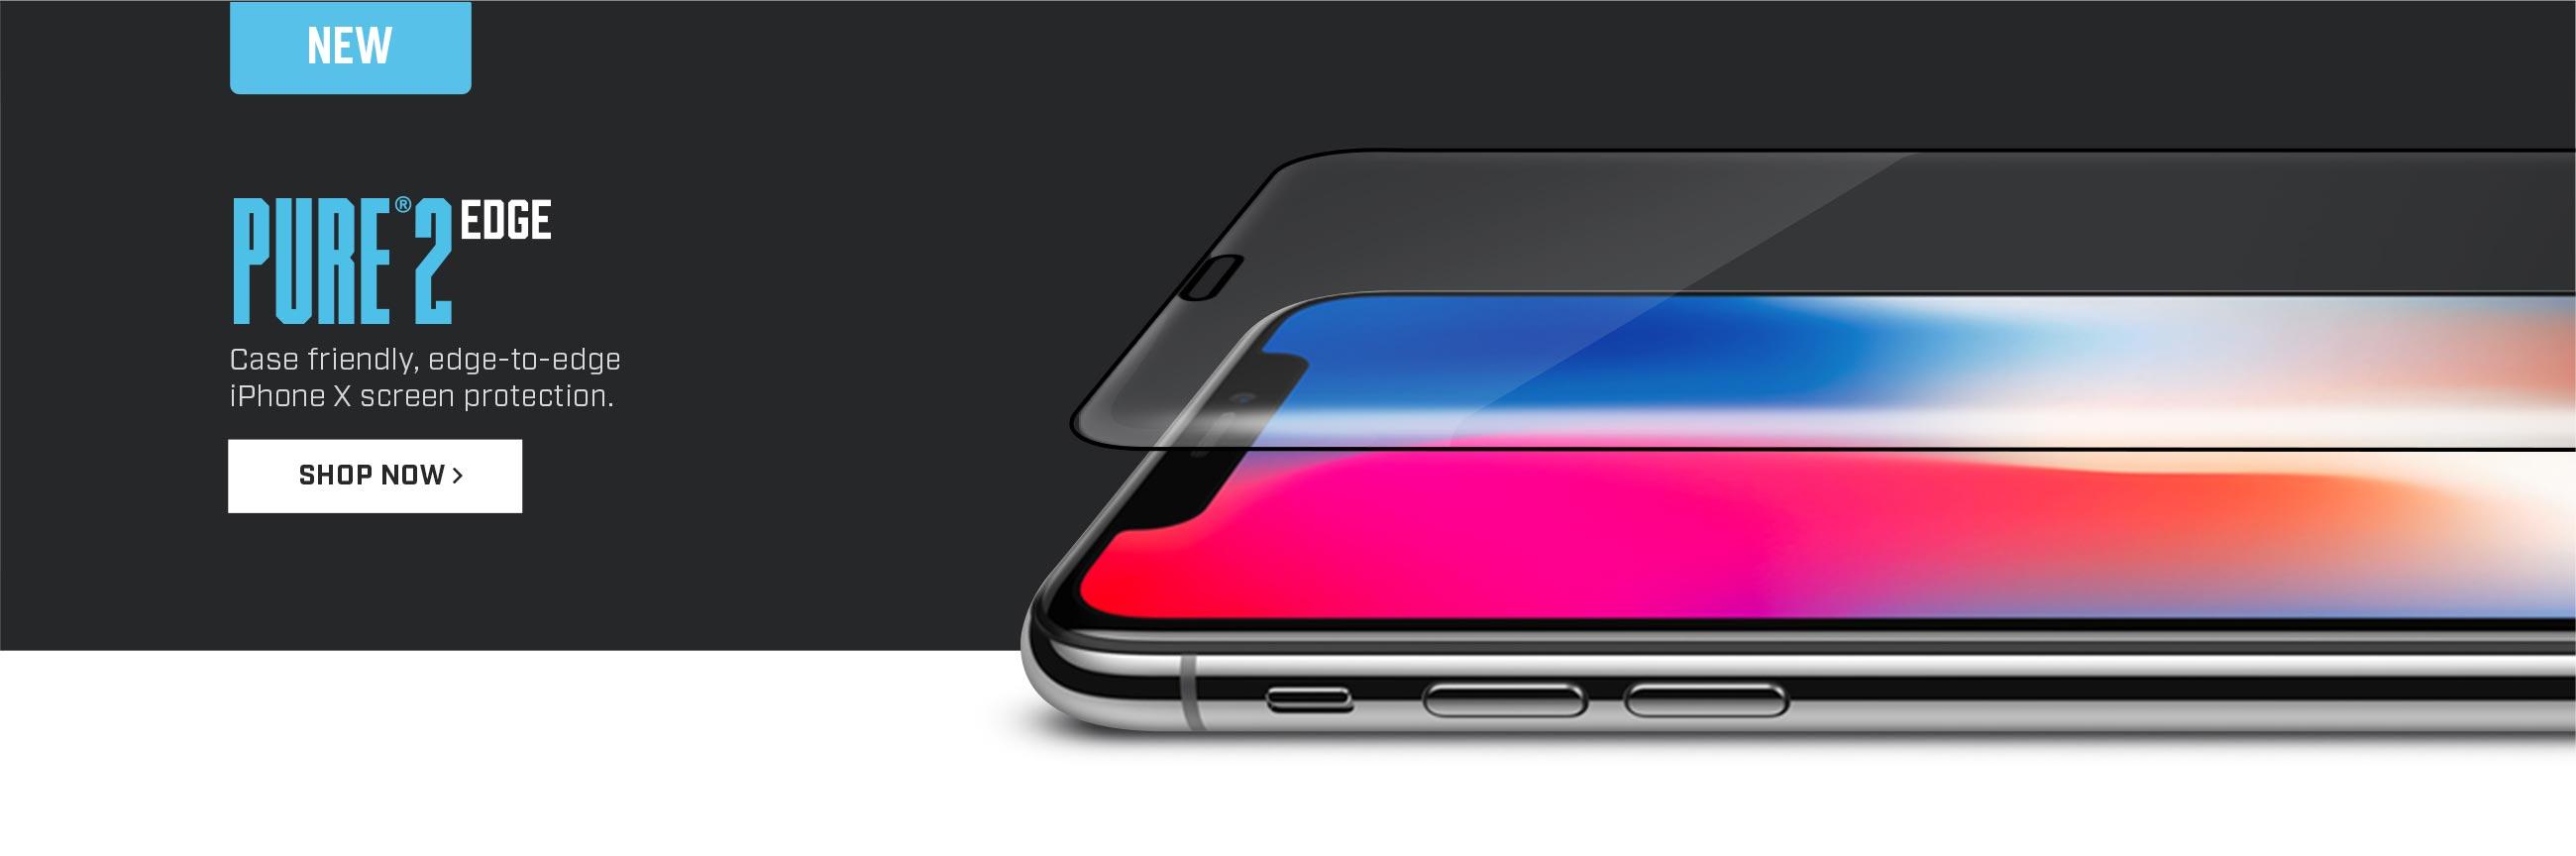 Case friendly, edge-to-edge screen protection